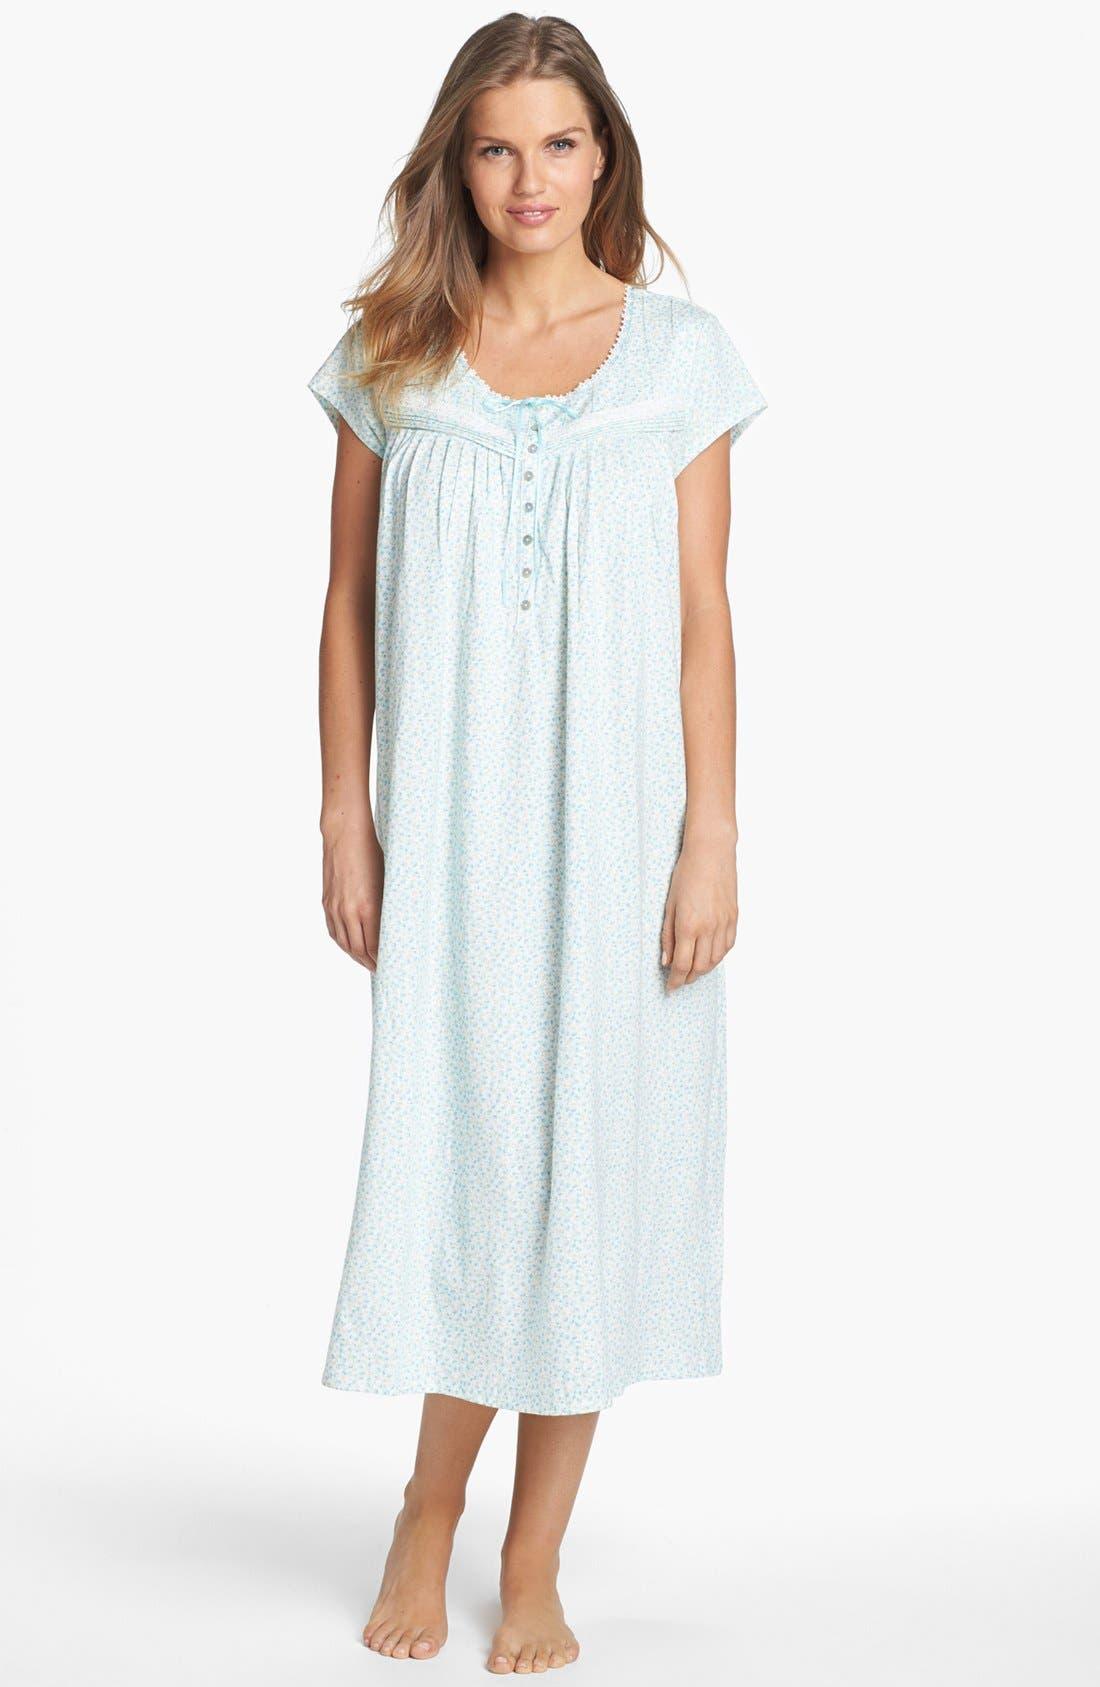 Alternate Image 1 Selected - Eileen West 'Wildflower Bluffs' Nightgown